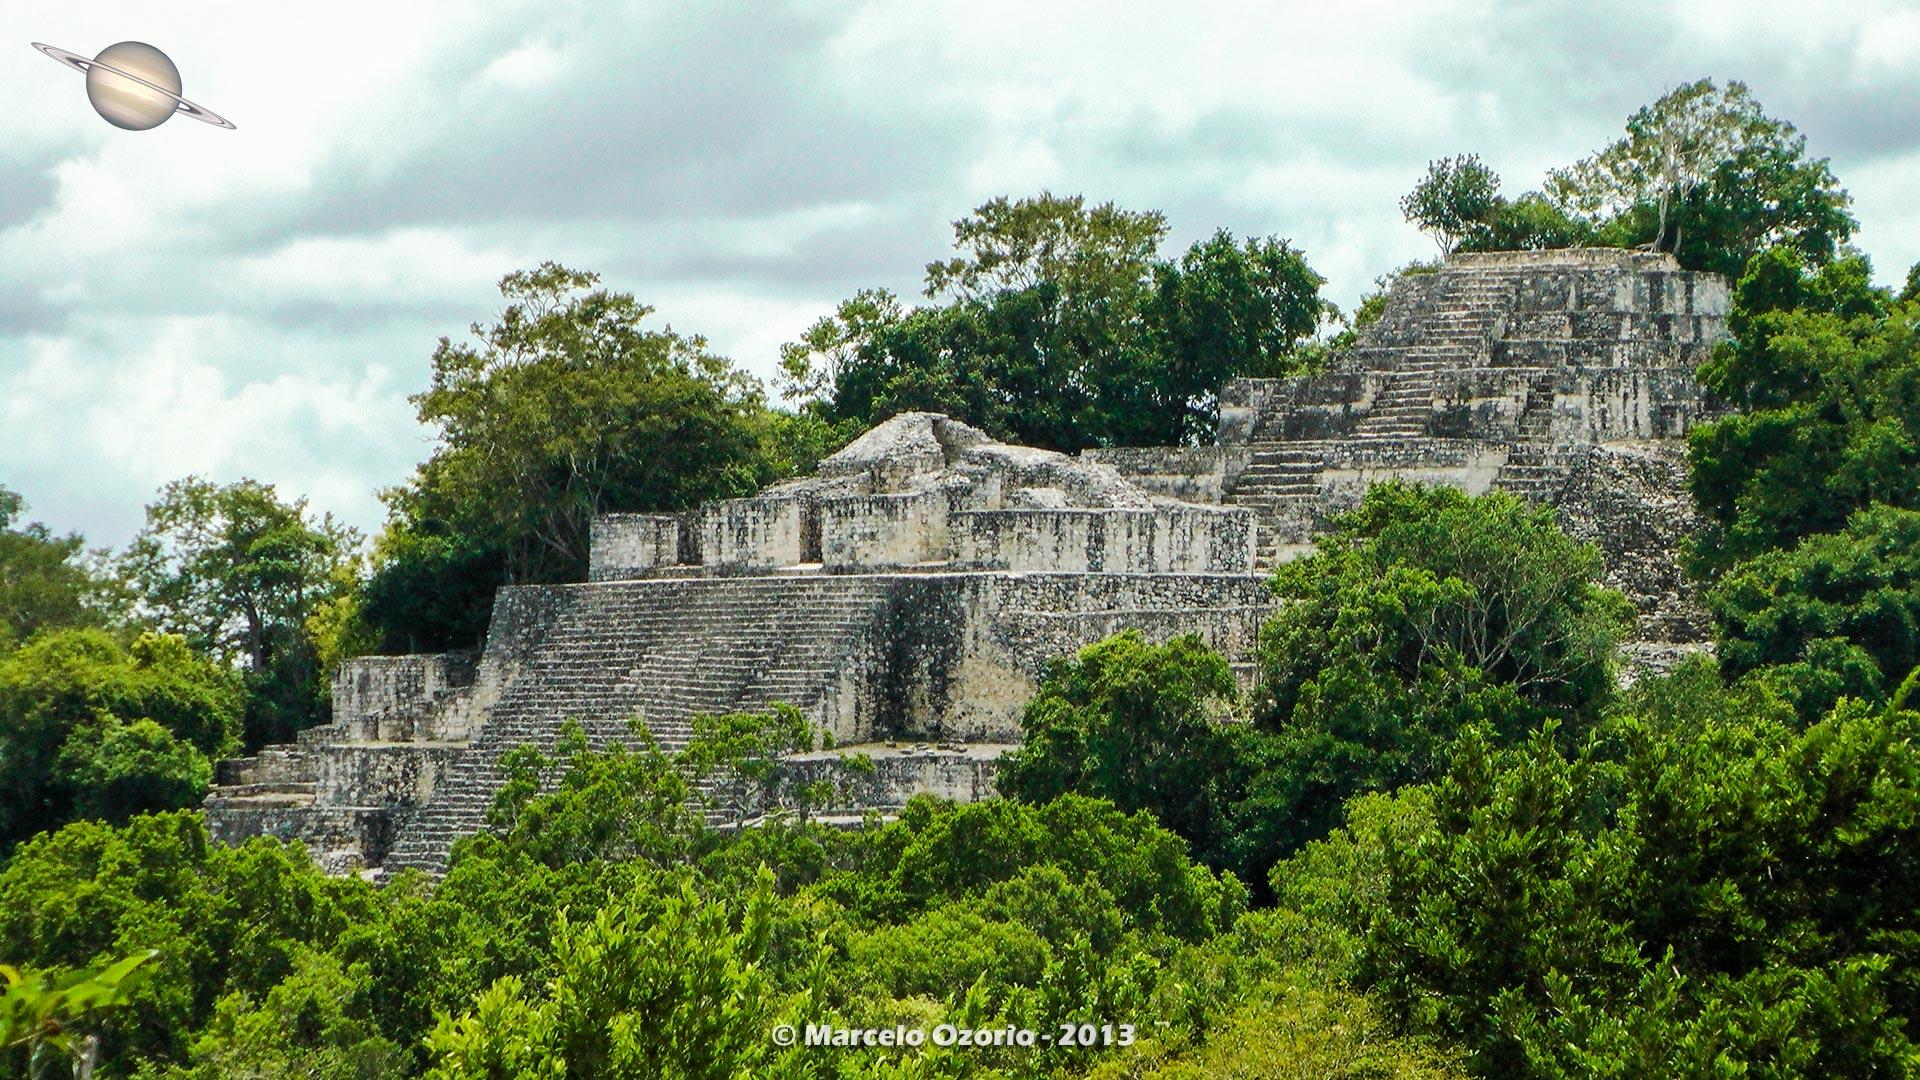 calakmul mayan civilization mexico 45 - Calakmul, City of the Two Adjacent Pyramids - Mexico